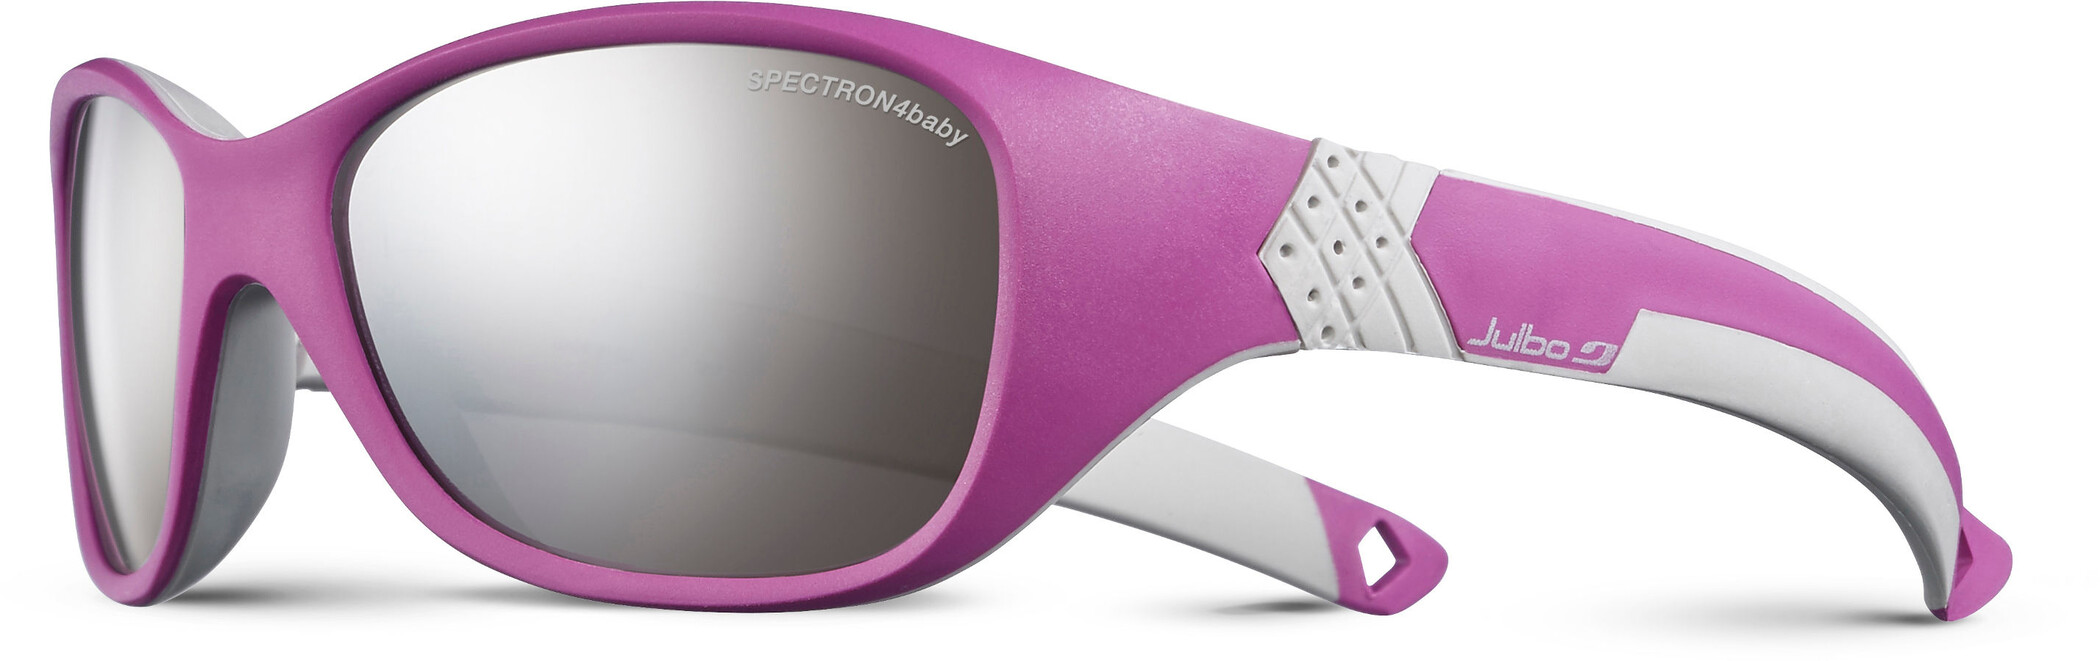 Julbo Solan Spectron 4 Solbriller 4-6Y Børn, pink/gray-gray flash silver | Briller